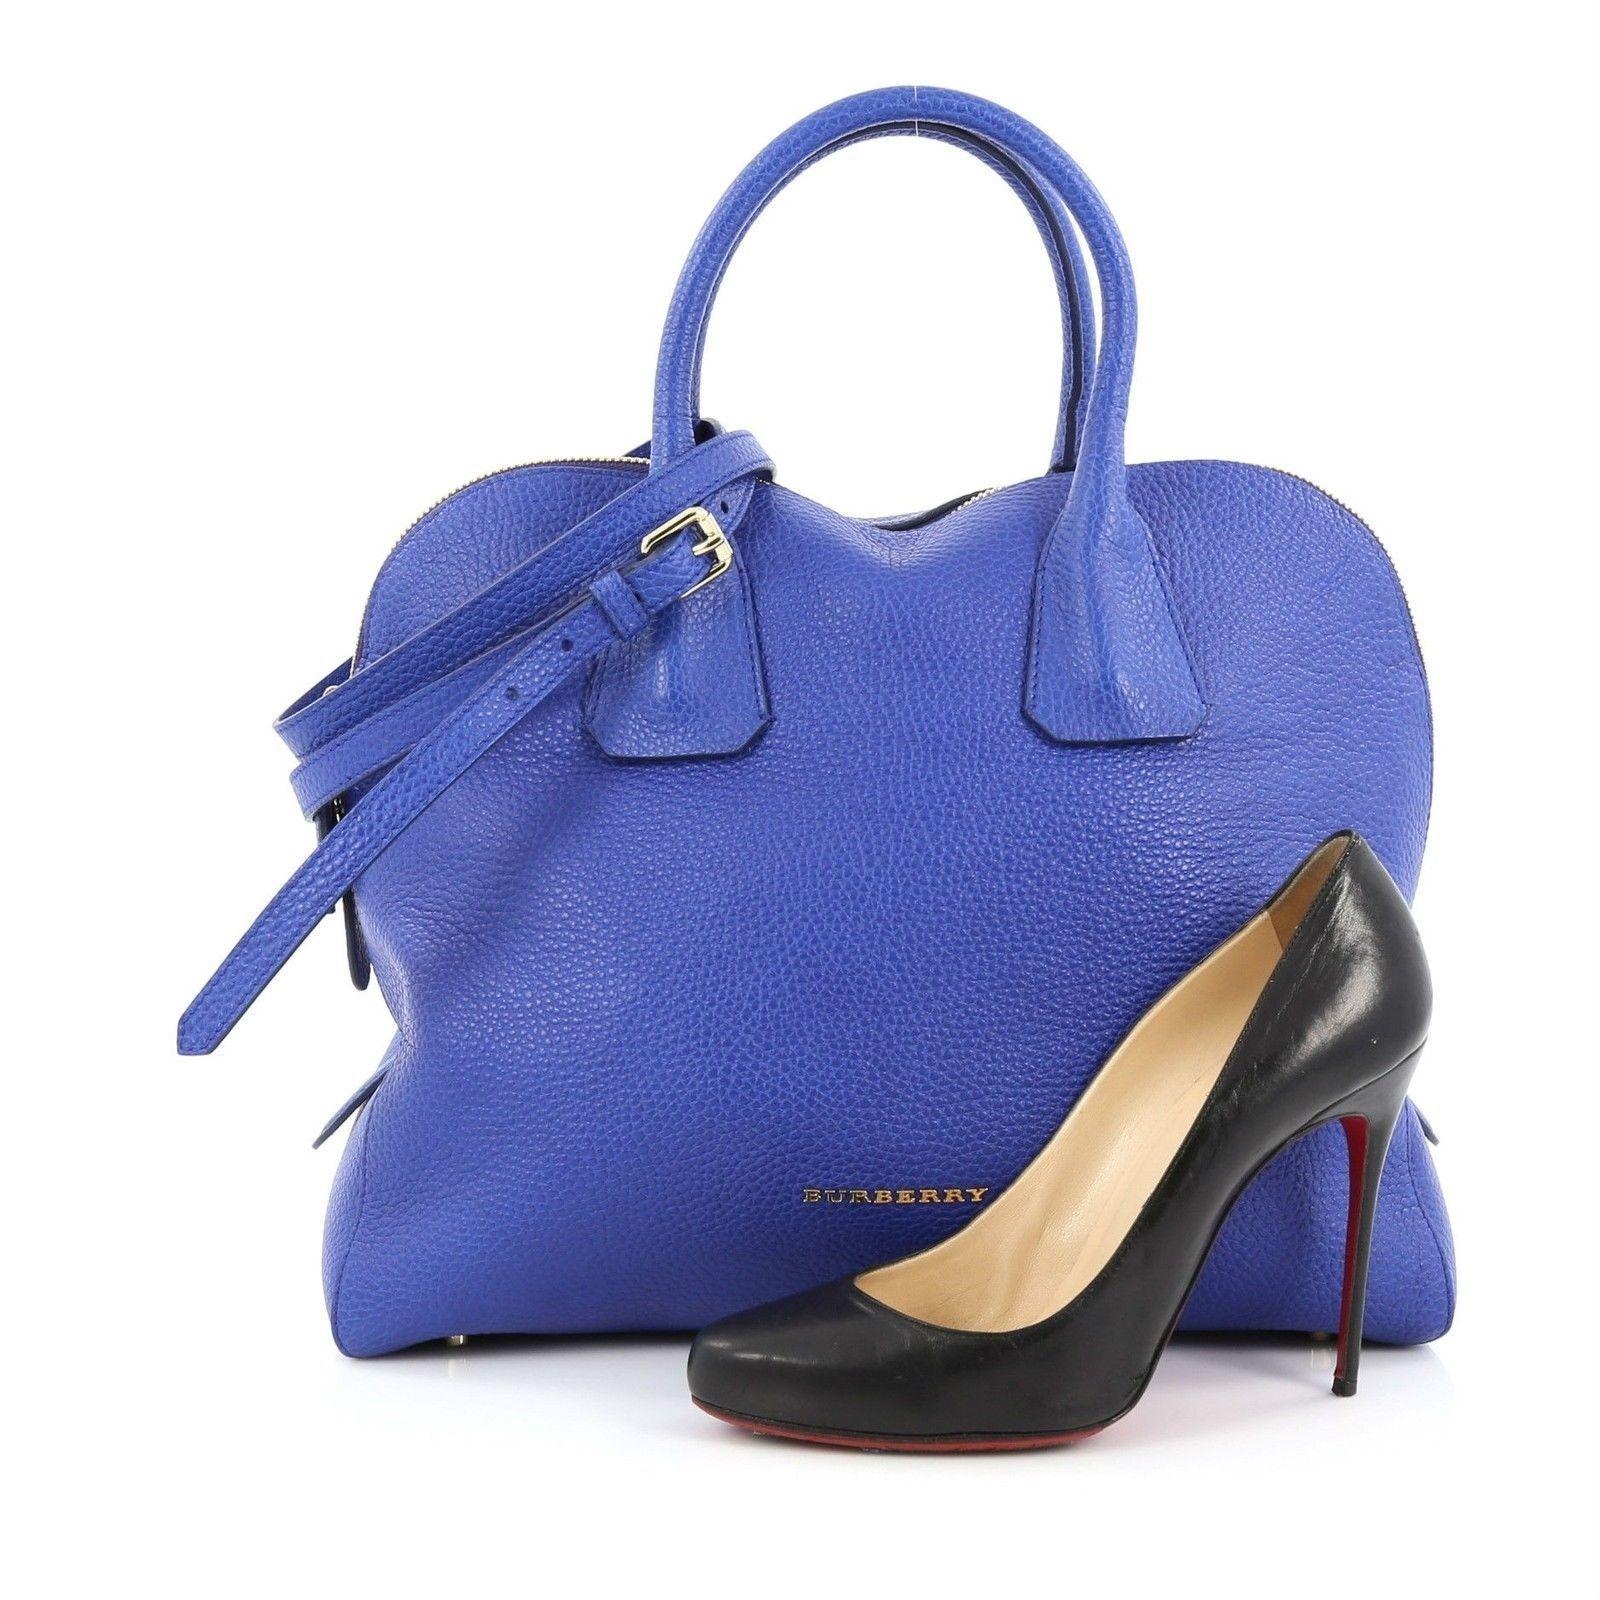 d3f37c9099 Burberry Greenwood Bowling Bag Grainy Leather Medium $610.0 | purses ...